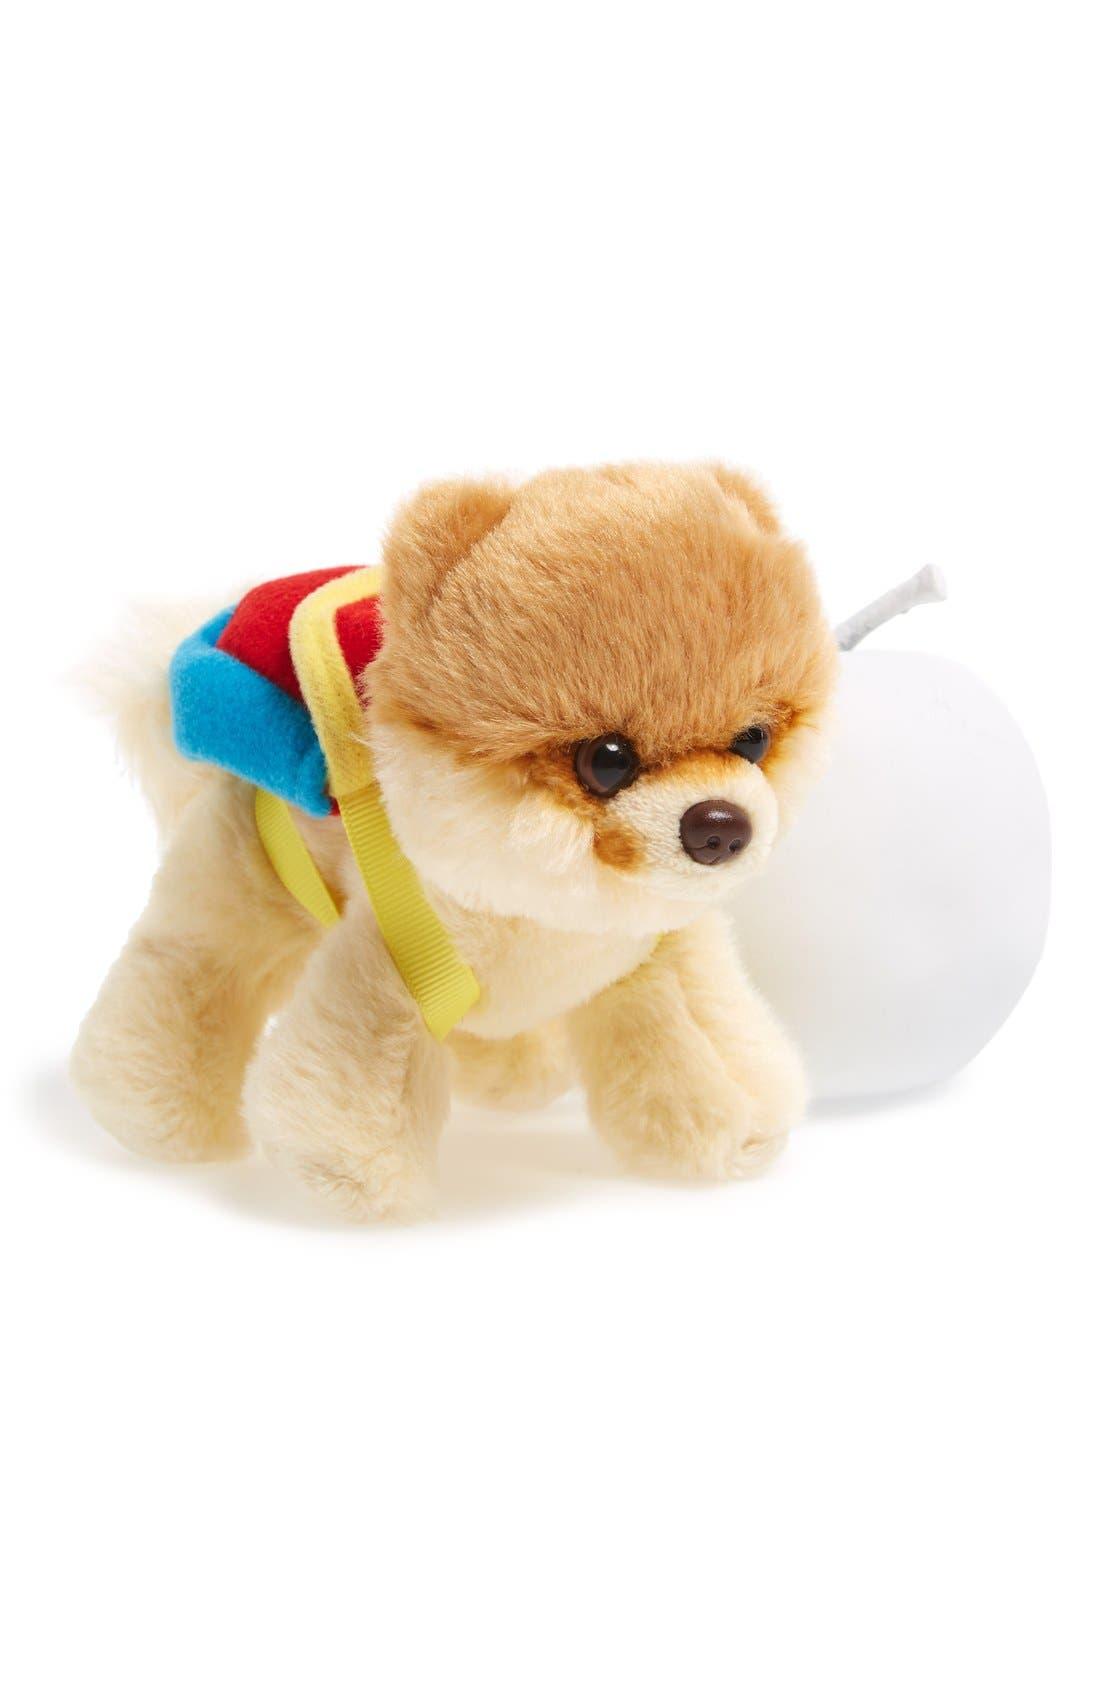 Alternate Image 1 Selected - Gund 'Itty Bitty Boo - Backpack' Stuffed Animal